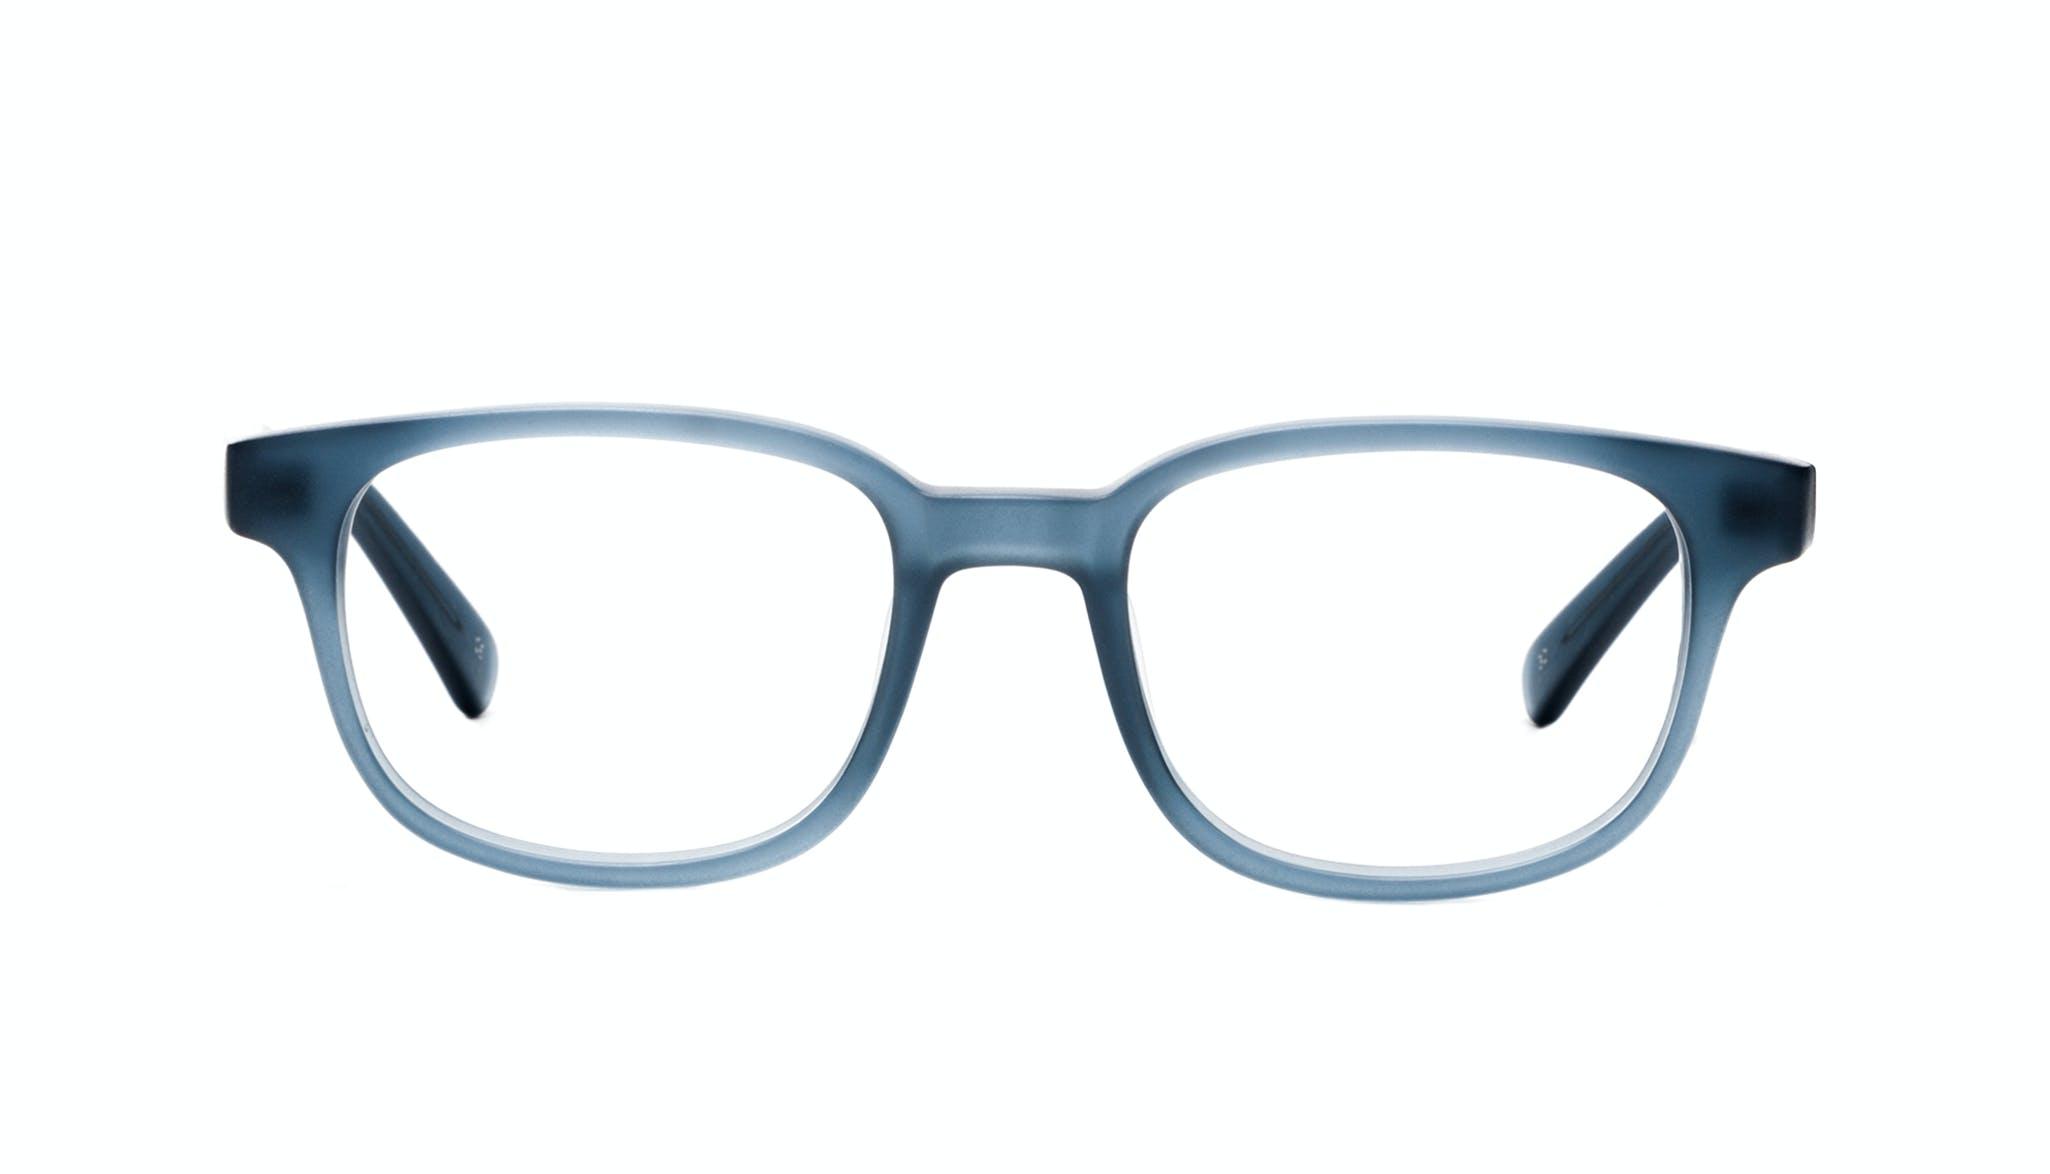 Affordable Fashion Glasses Rectangle Square Eyeglasses Men Magnetic Midnight Blue Front